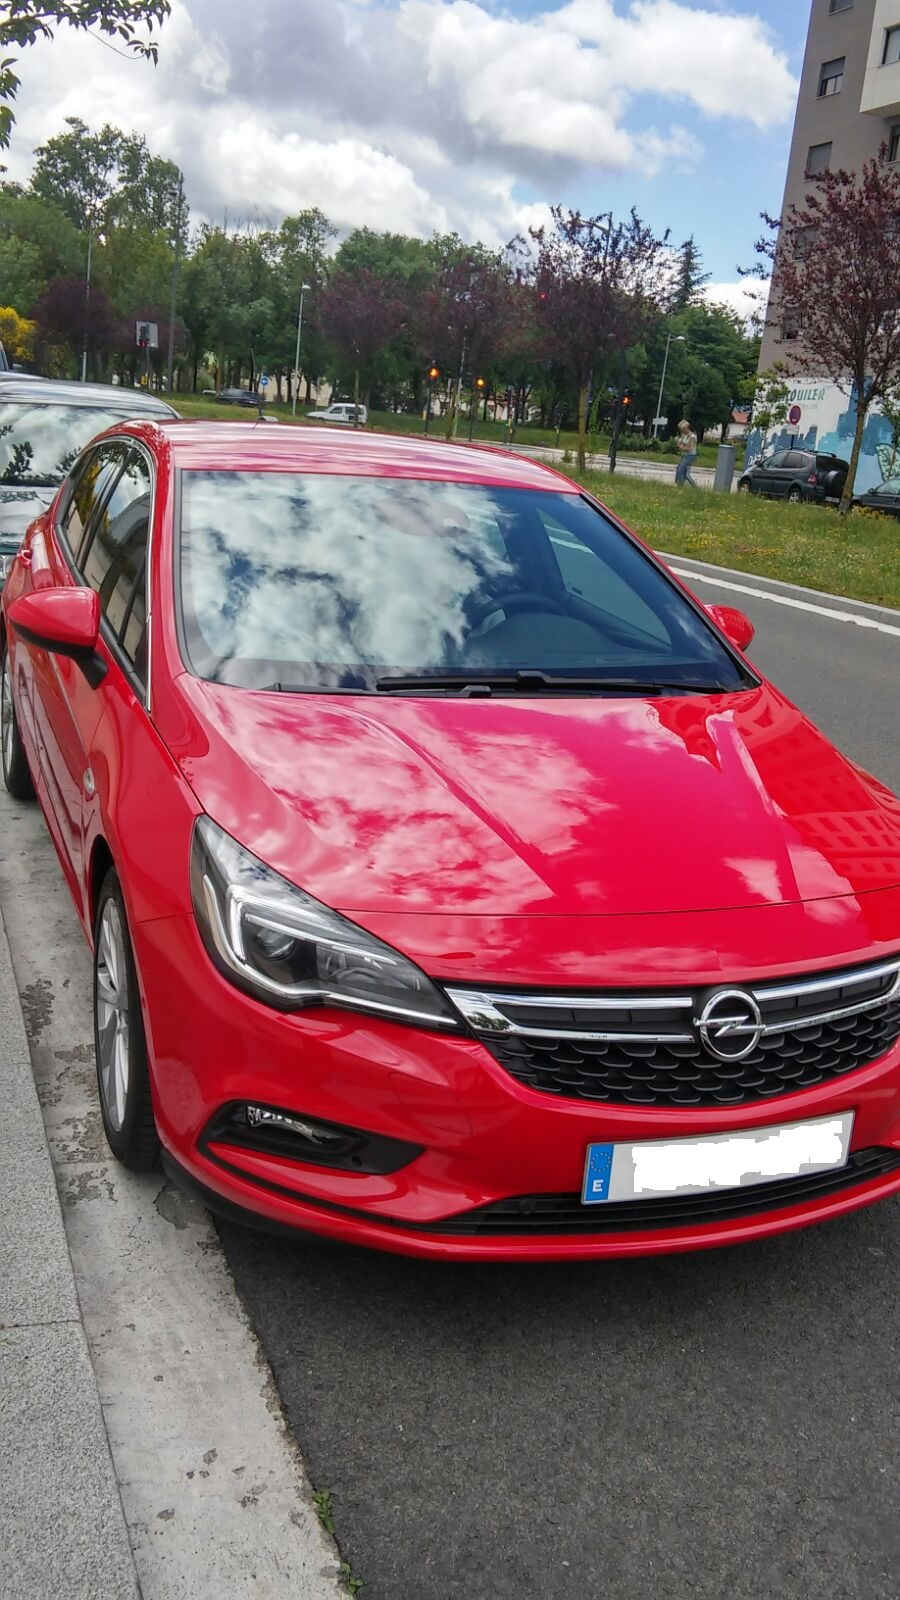 Mi Opel Astra K 1.6 CDTI 110cv Dynamic Rojo pasión (FOTOS ACTUALES) D7bYSN